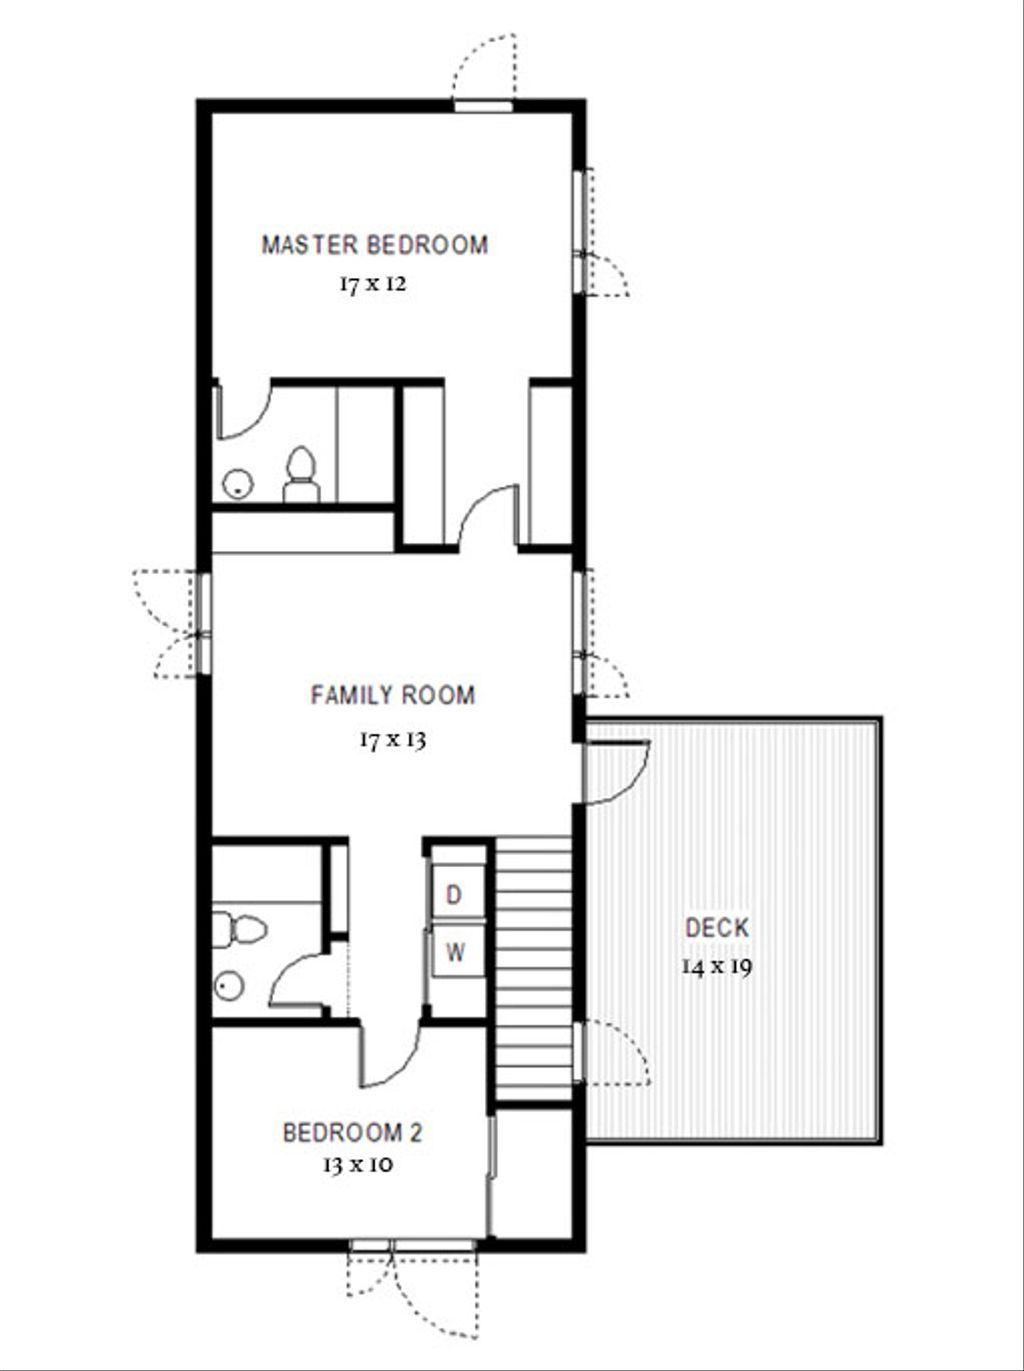 Modern style house plan 3 beds 3 baths 1900 sq ft plan